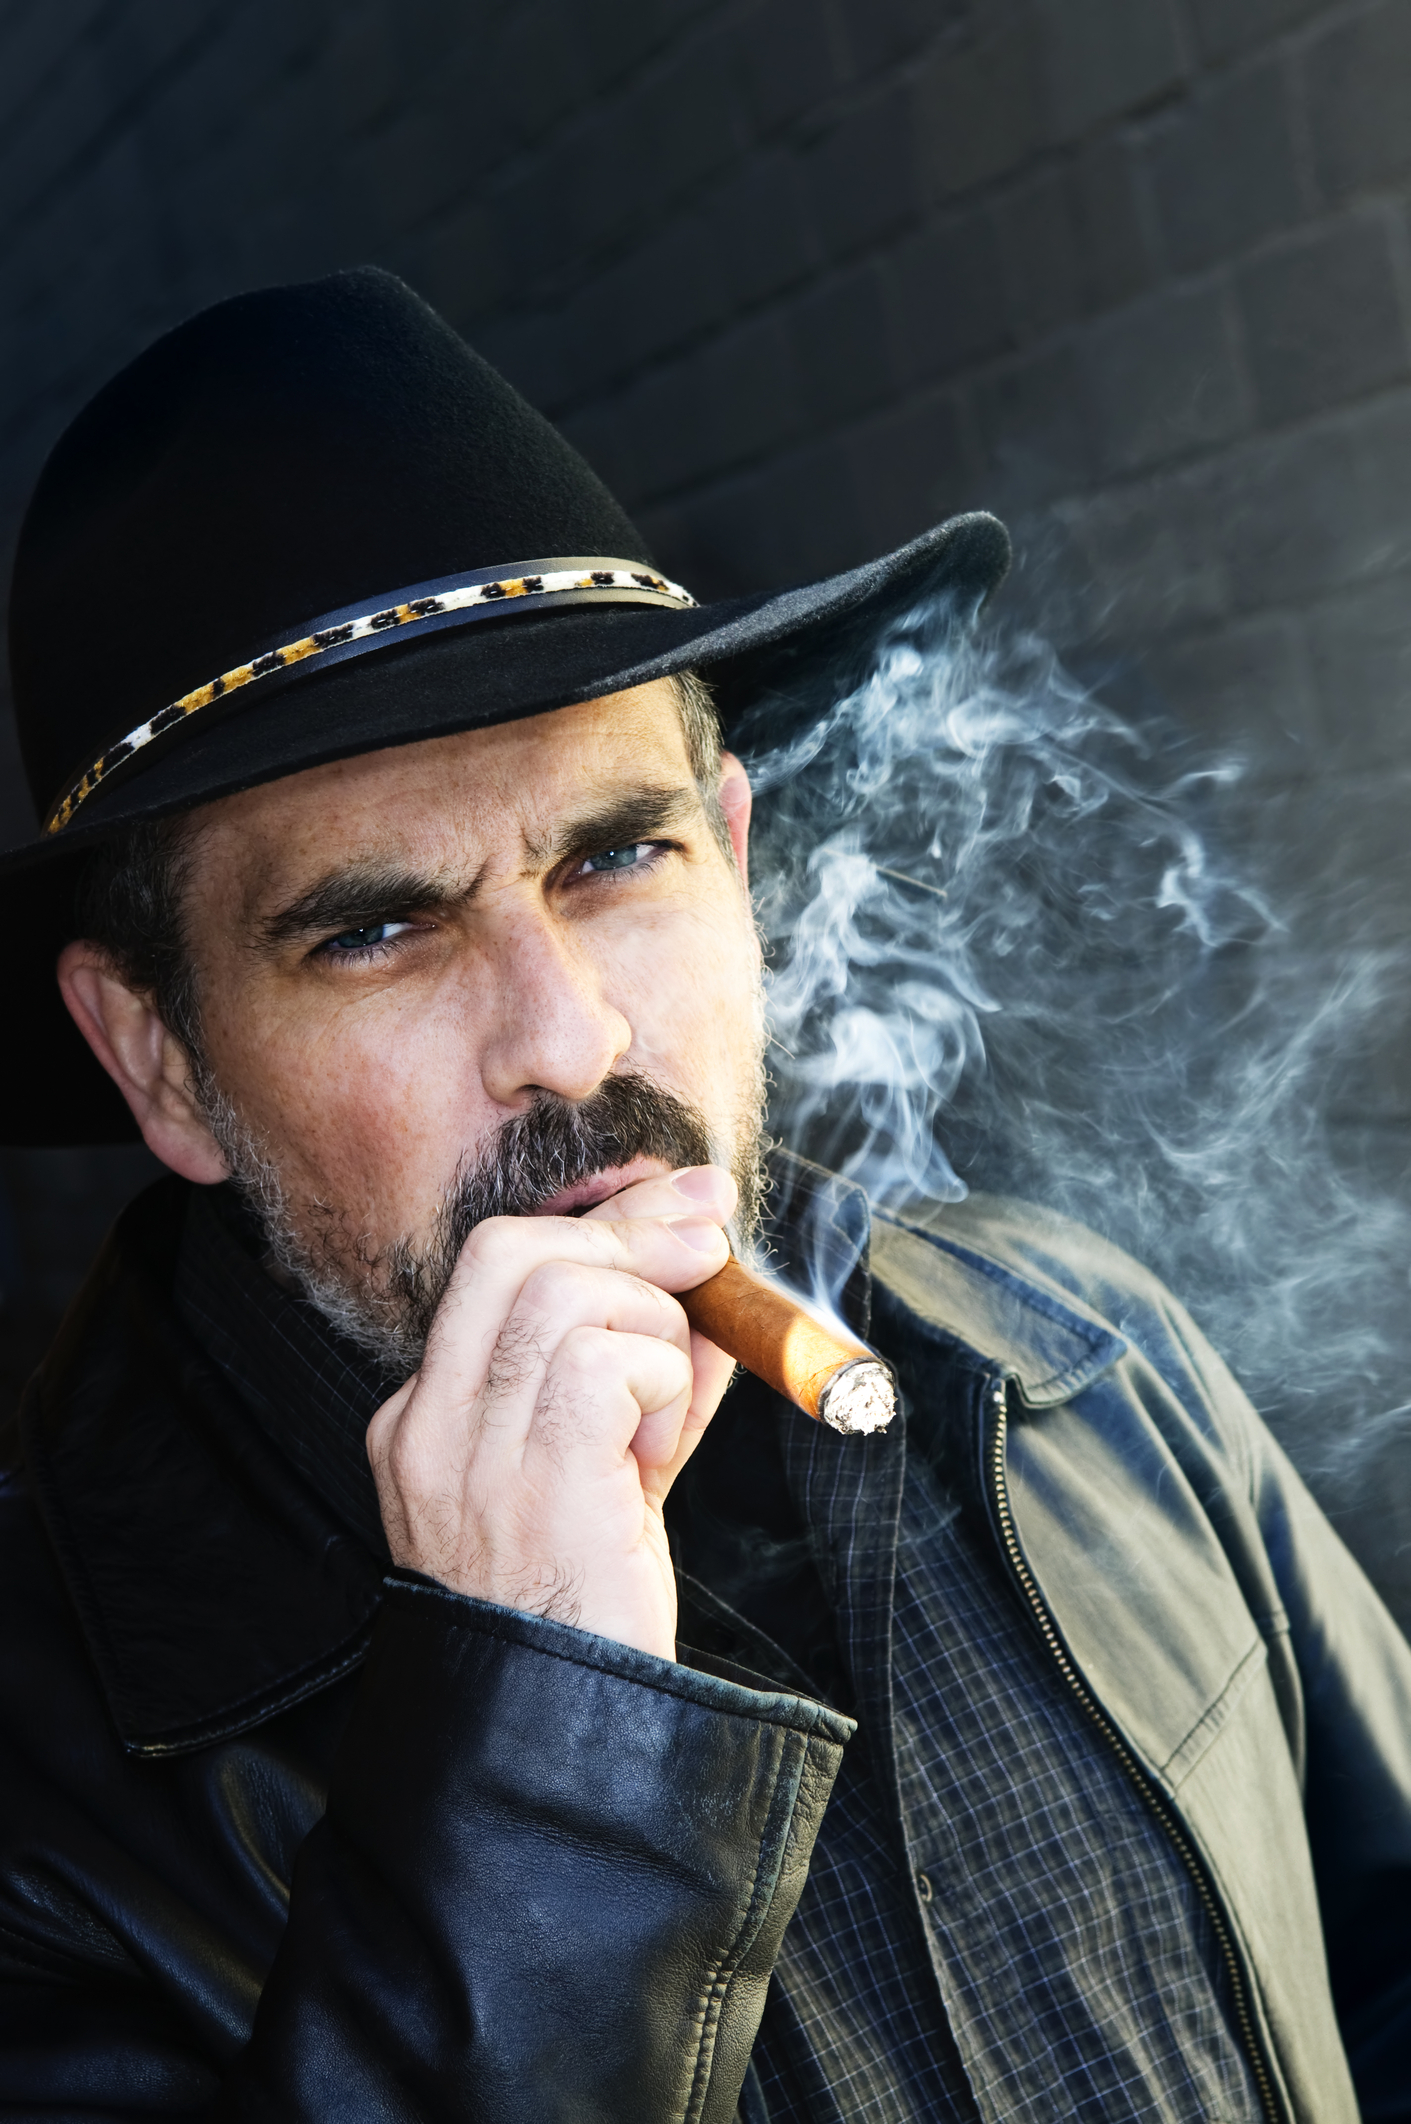 http://www.dreamstime.com/stock-photo-bearded-man-smoking-cigar-image11989340